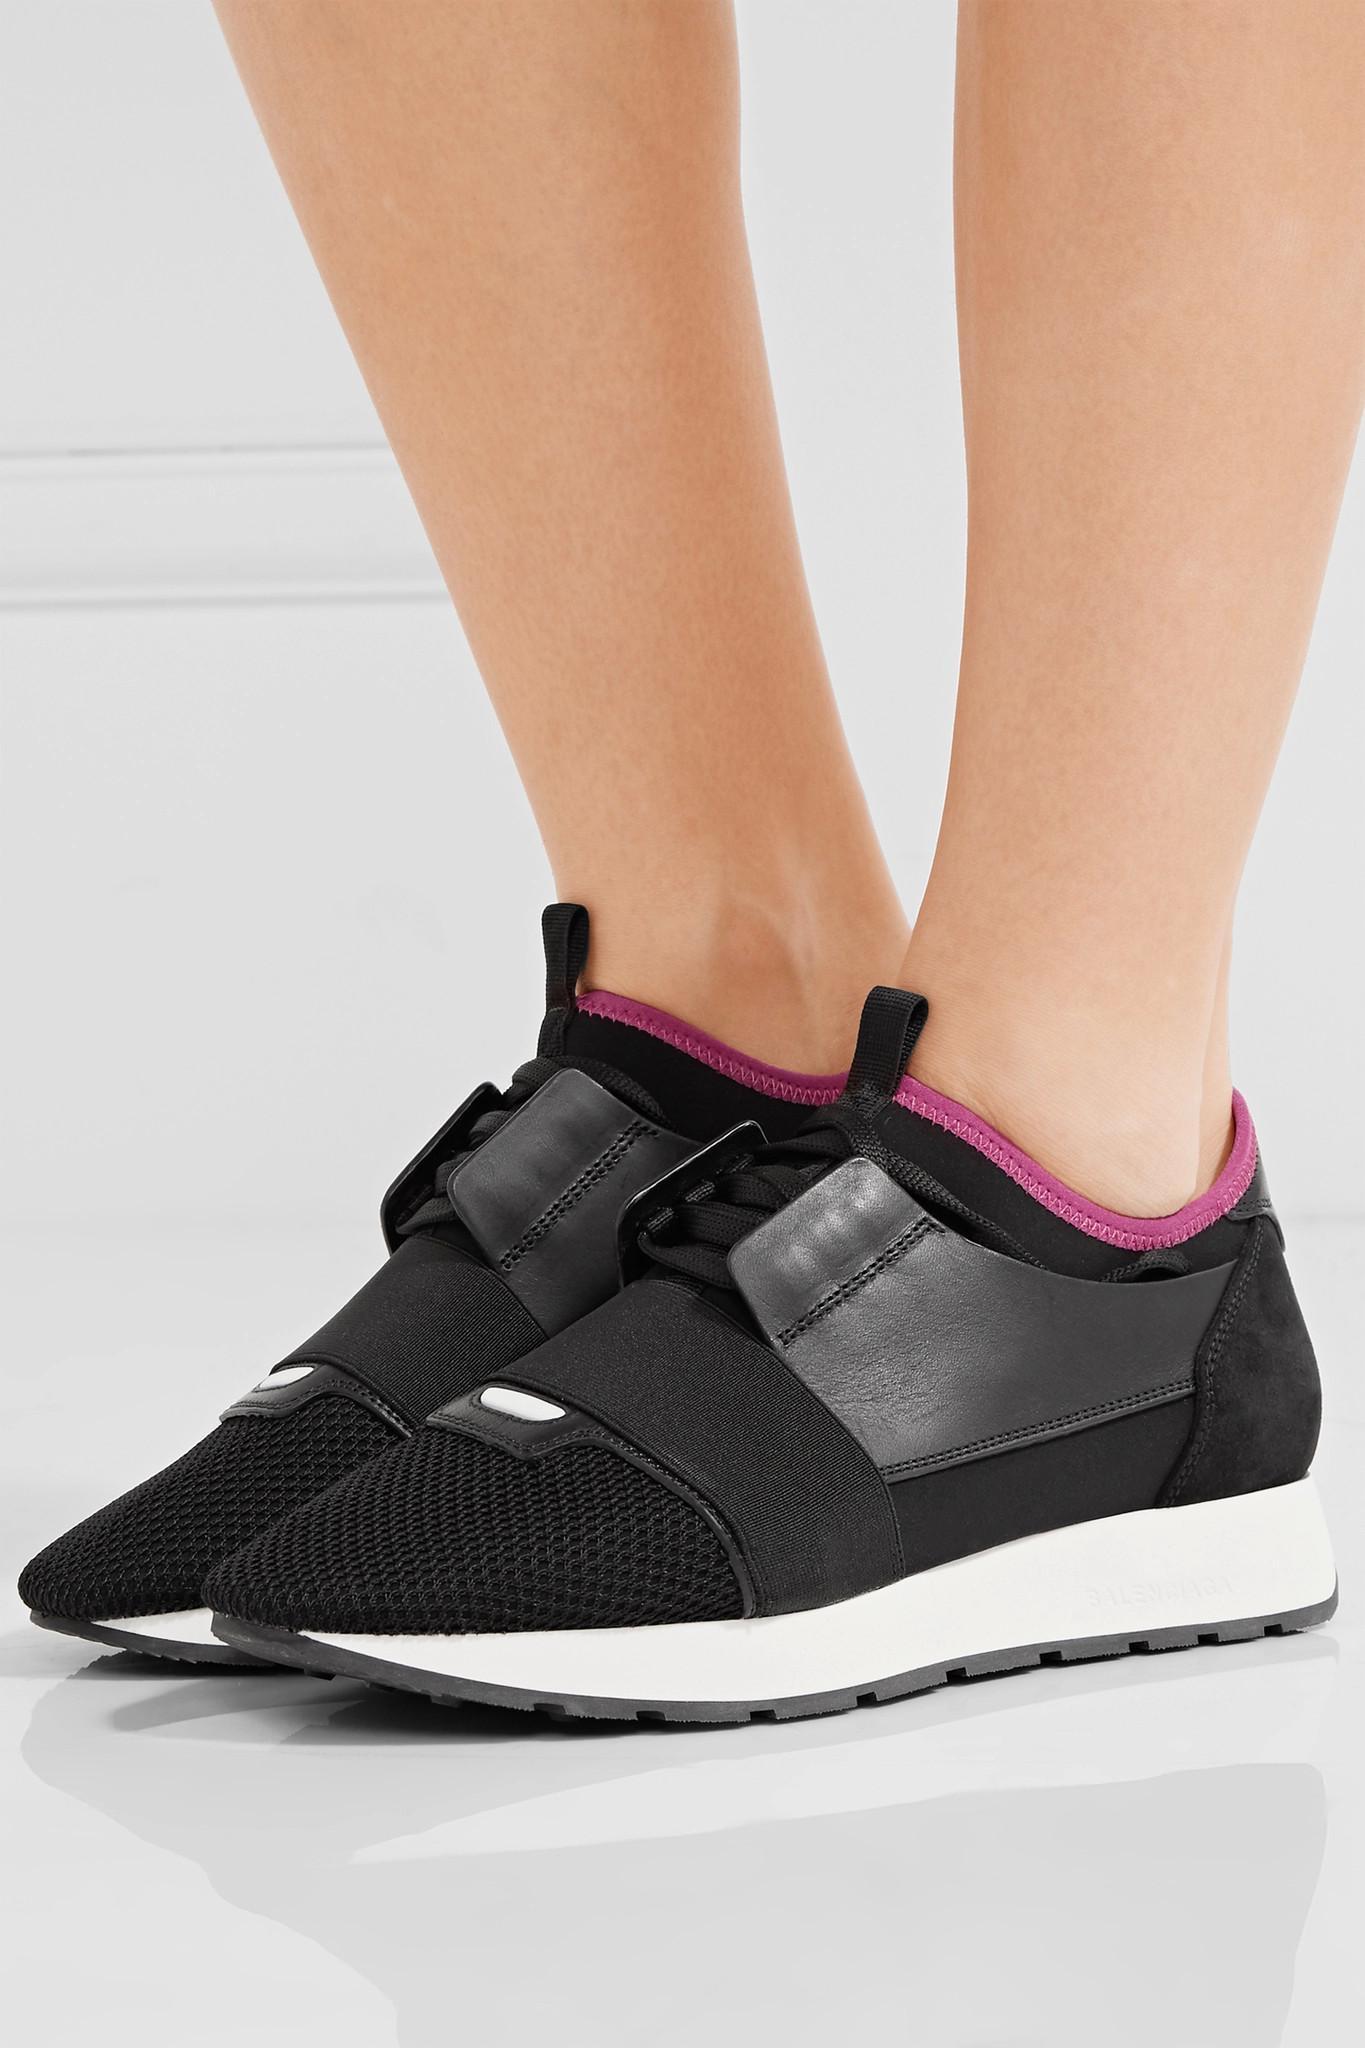 BalenciagaRace Runner Leather & Mesh Sneakers QR0UyQ6I